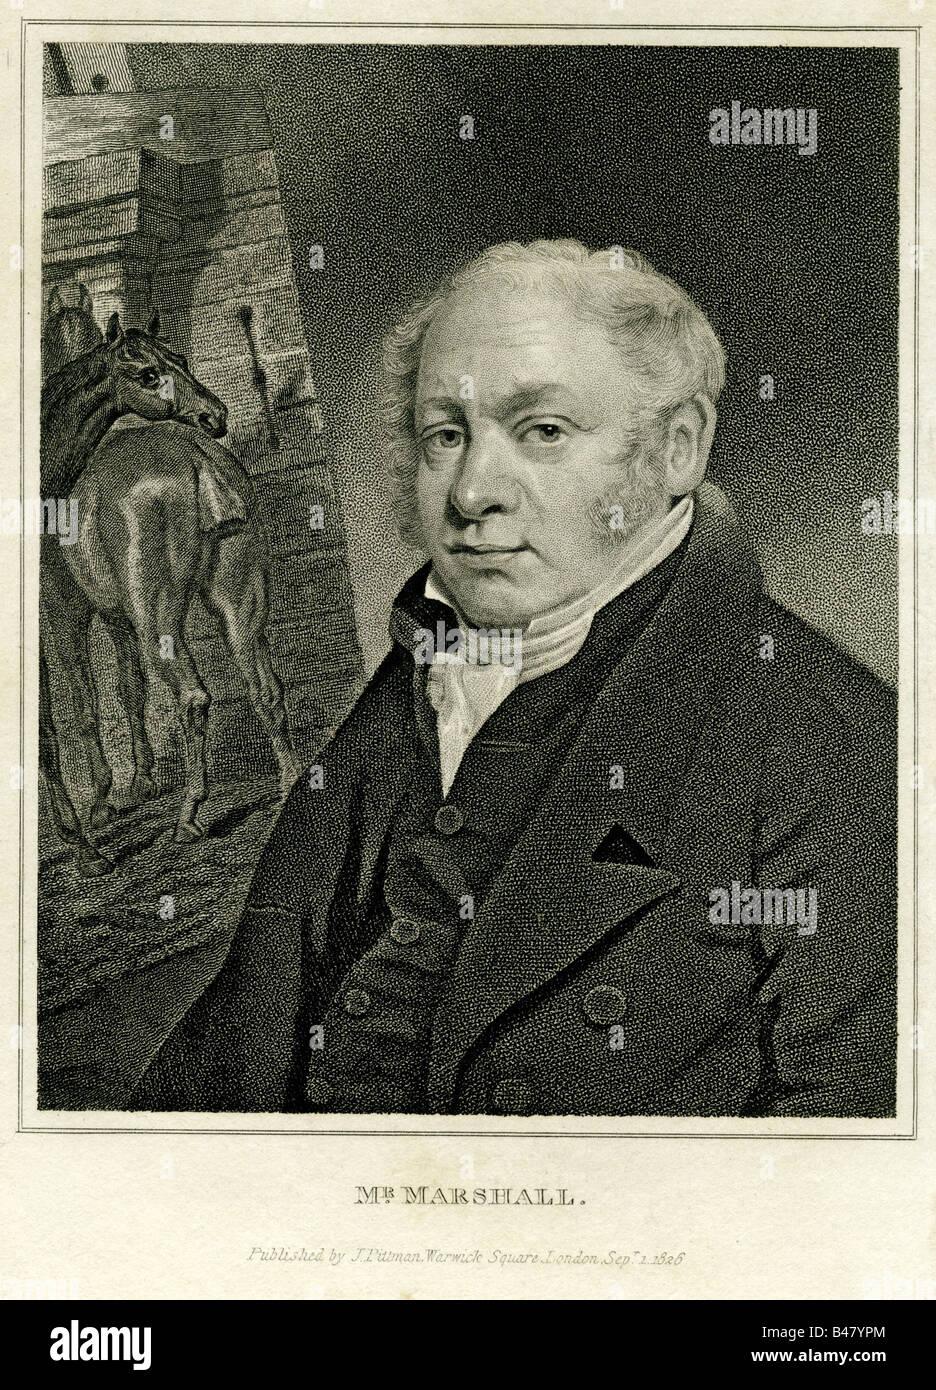 Marshall, Humphrey, 1760 - 3.7.1841, American Politician, half length, engraving, printed by J. Pittman, London - Stock Image